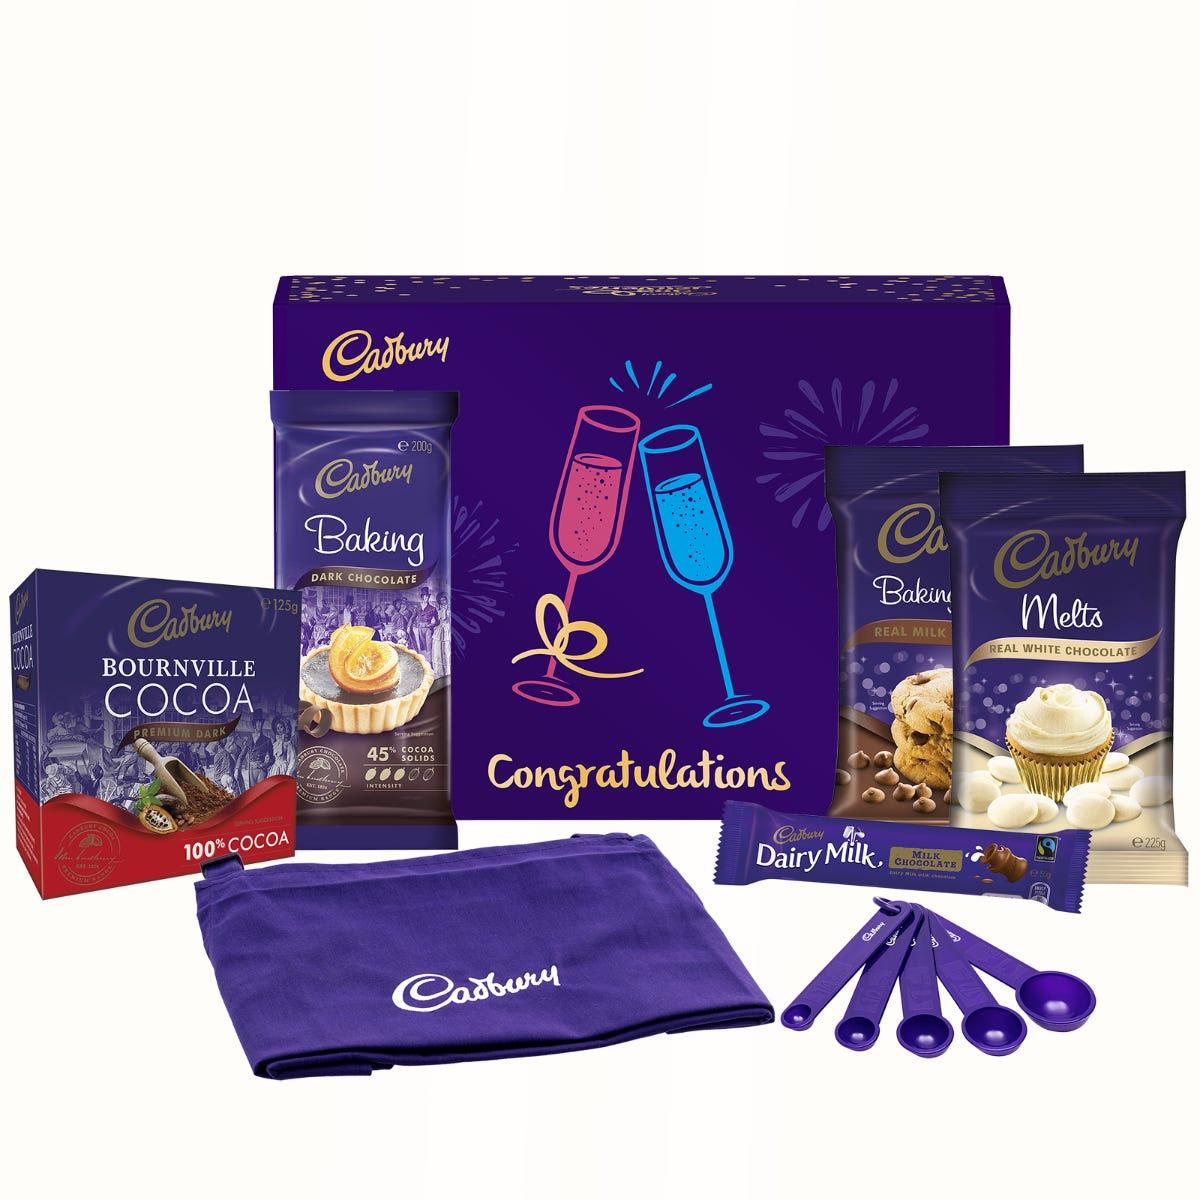 Cadbury Baking Gift Pack - Congratulations